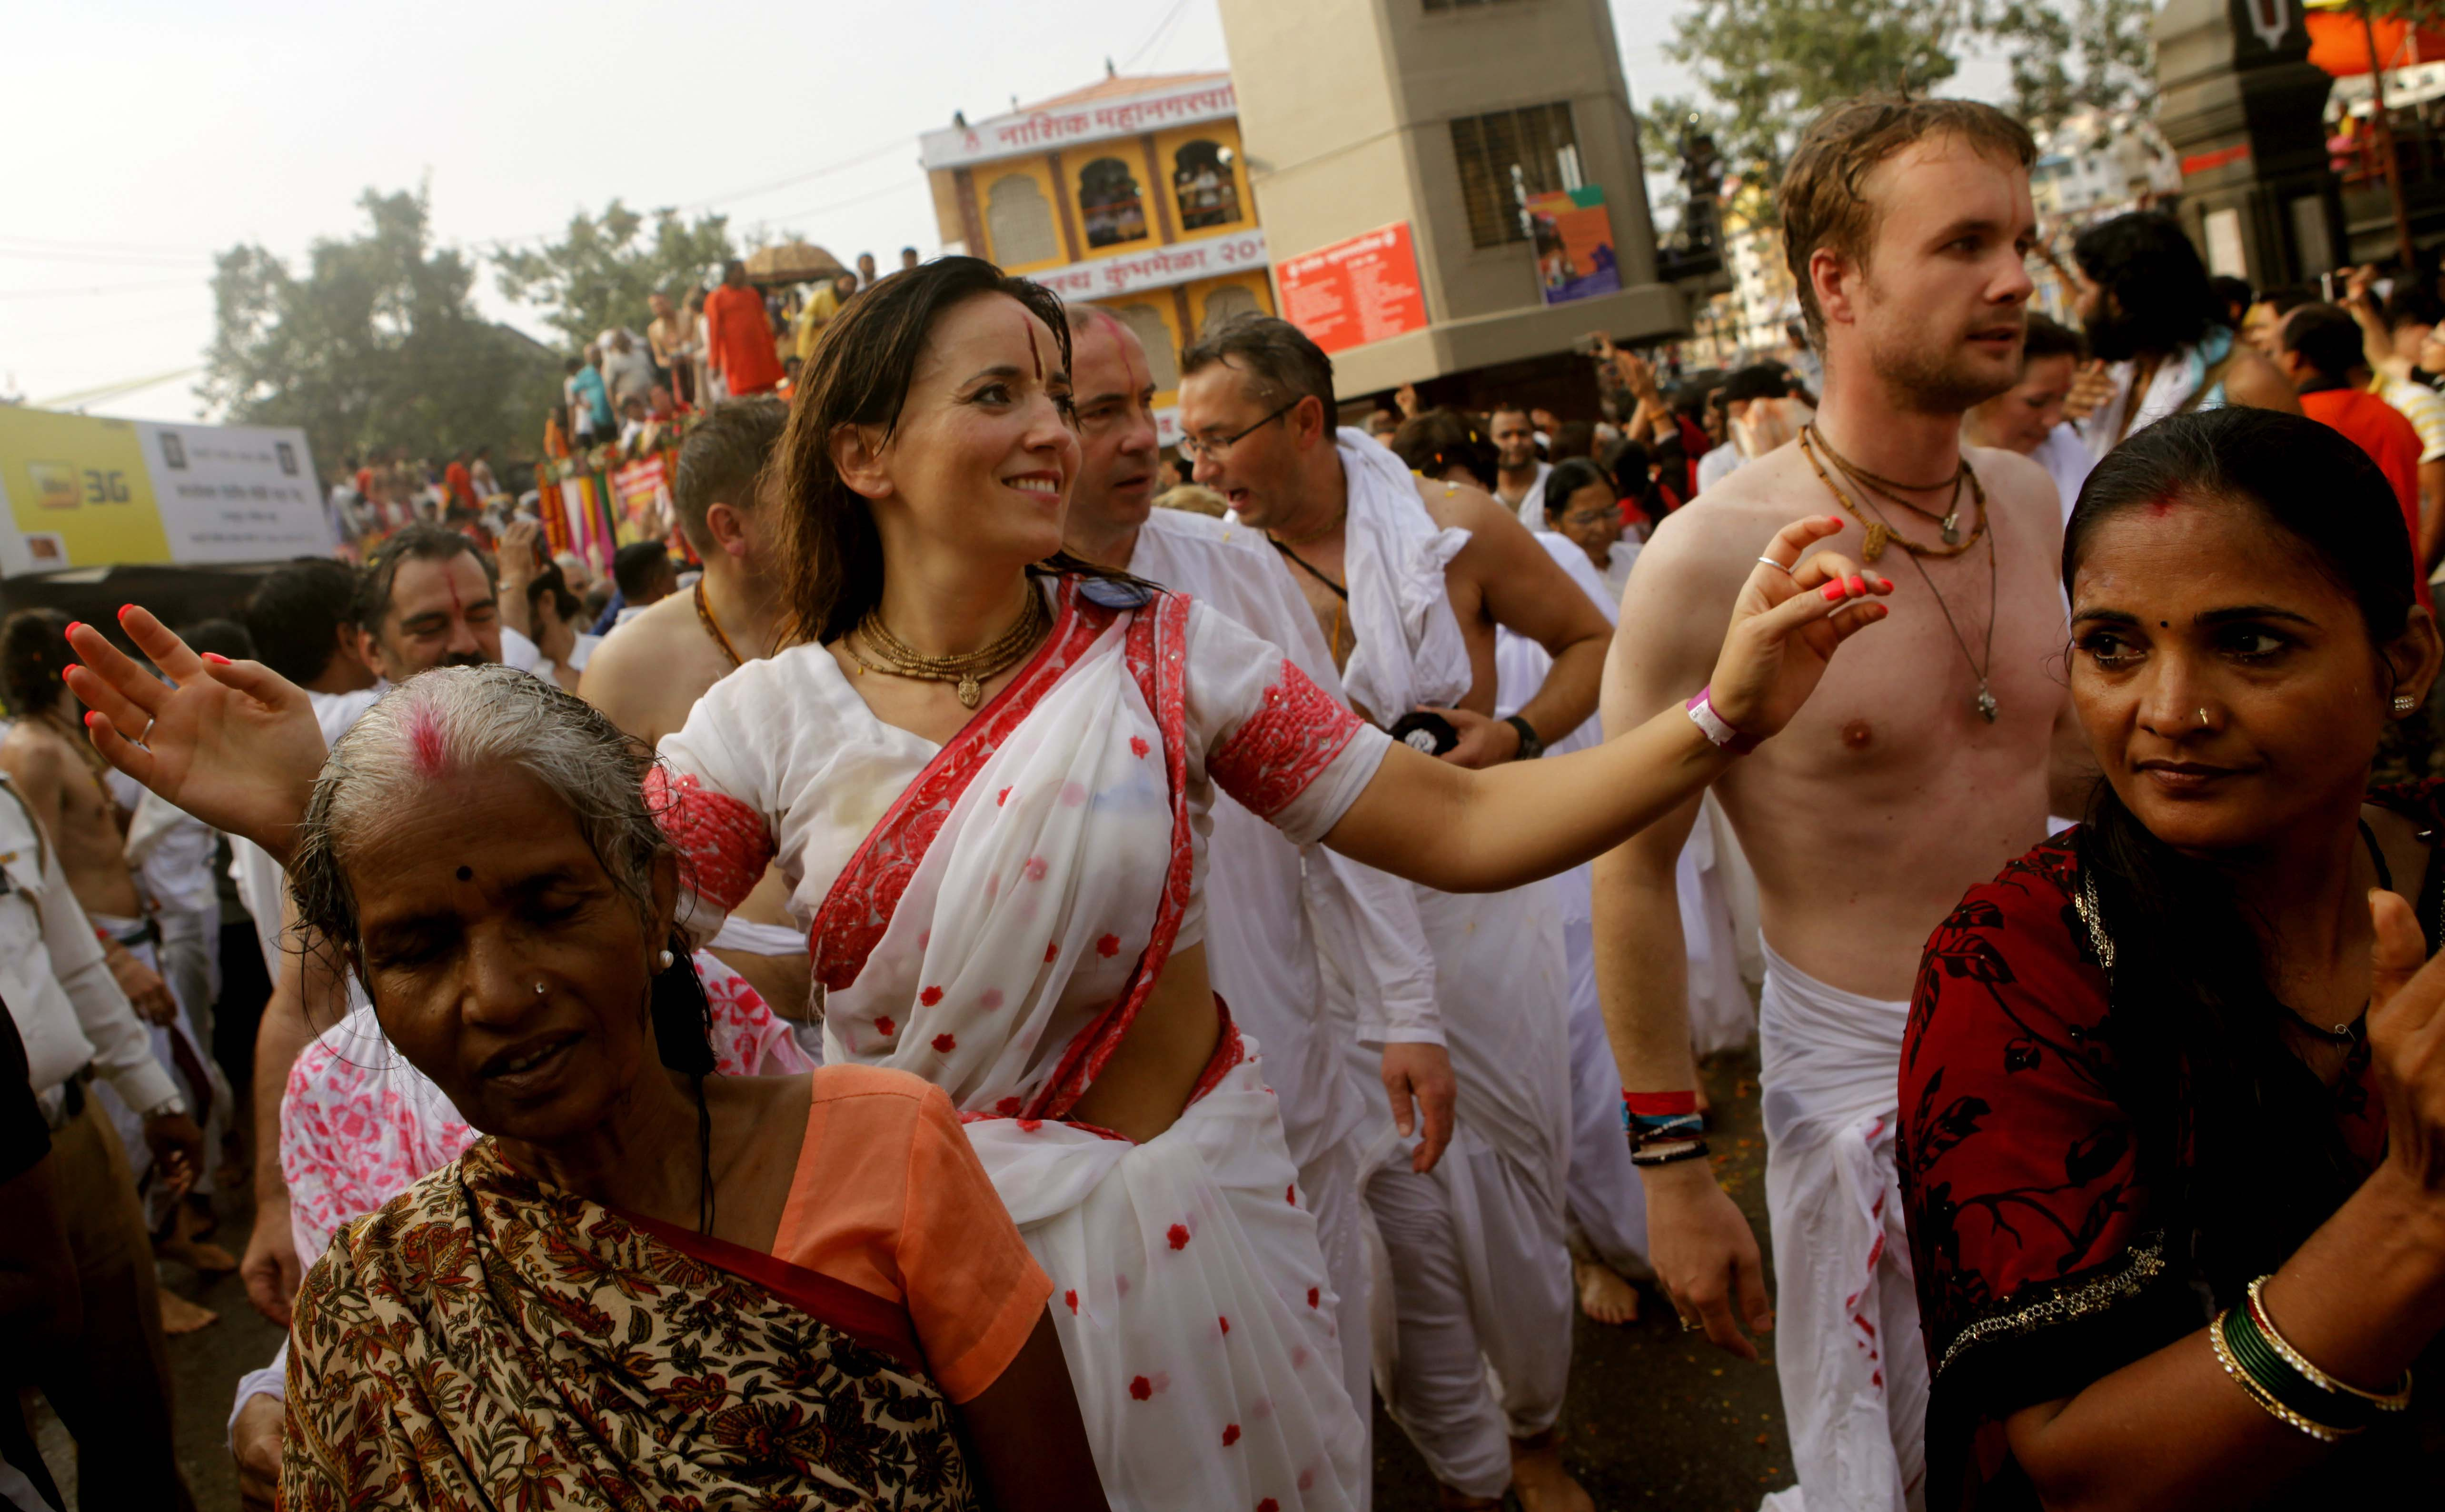 Foreigners join akhadas sadhus during the second Shahi Snan of Simhastha Kumbh Mela in Nashik, India, on Sept. 13, 2015.